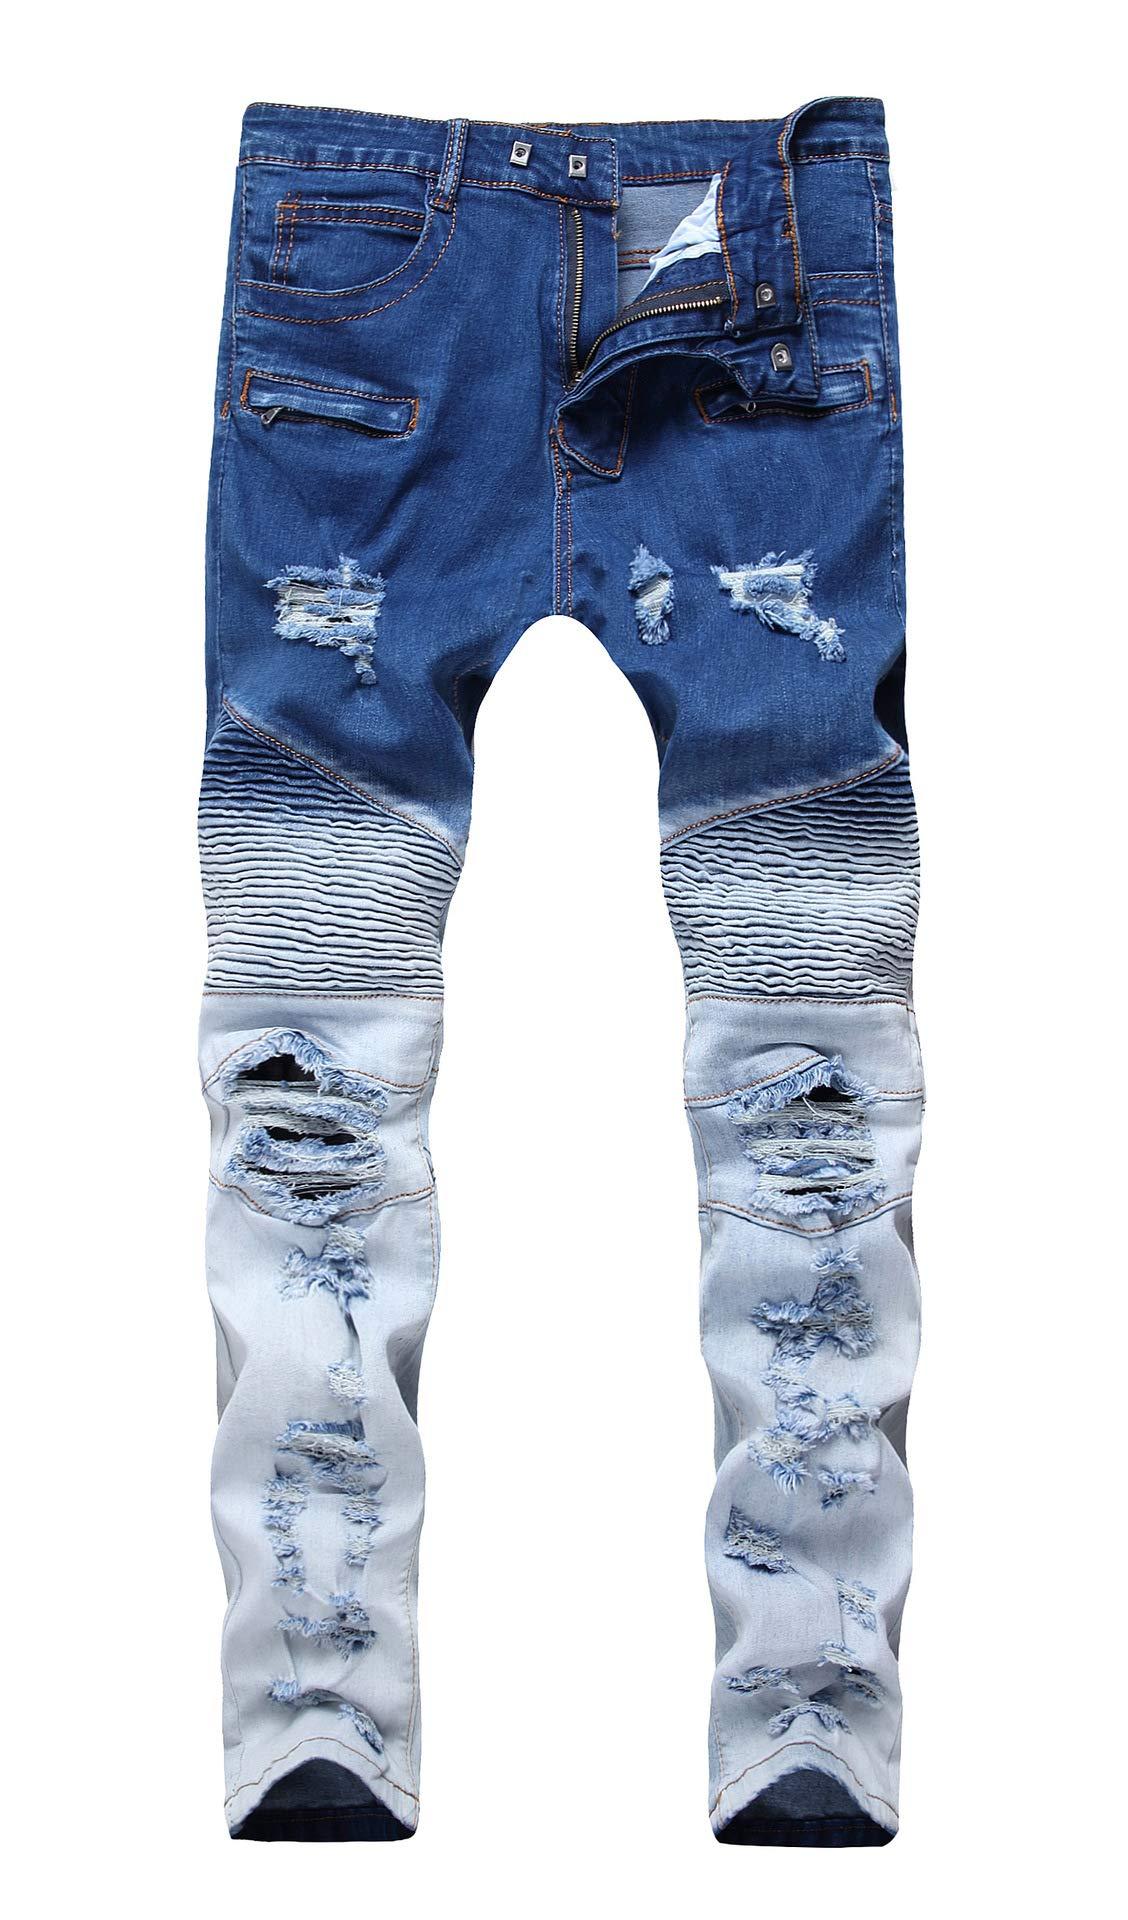 COLINNA Men's Moto Biker Vintage Distressed Ripped Slim Fit Skinny Stretch Denim Jeans